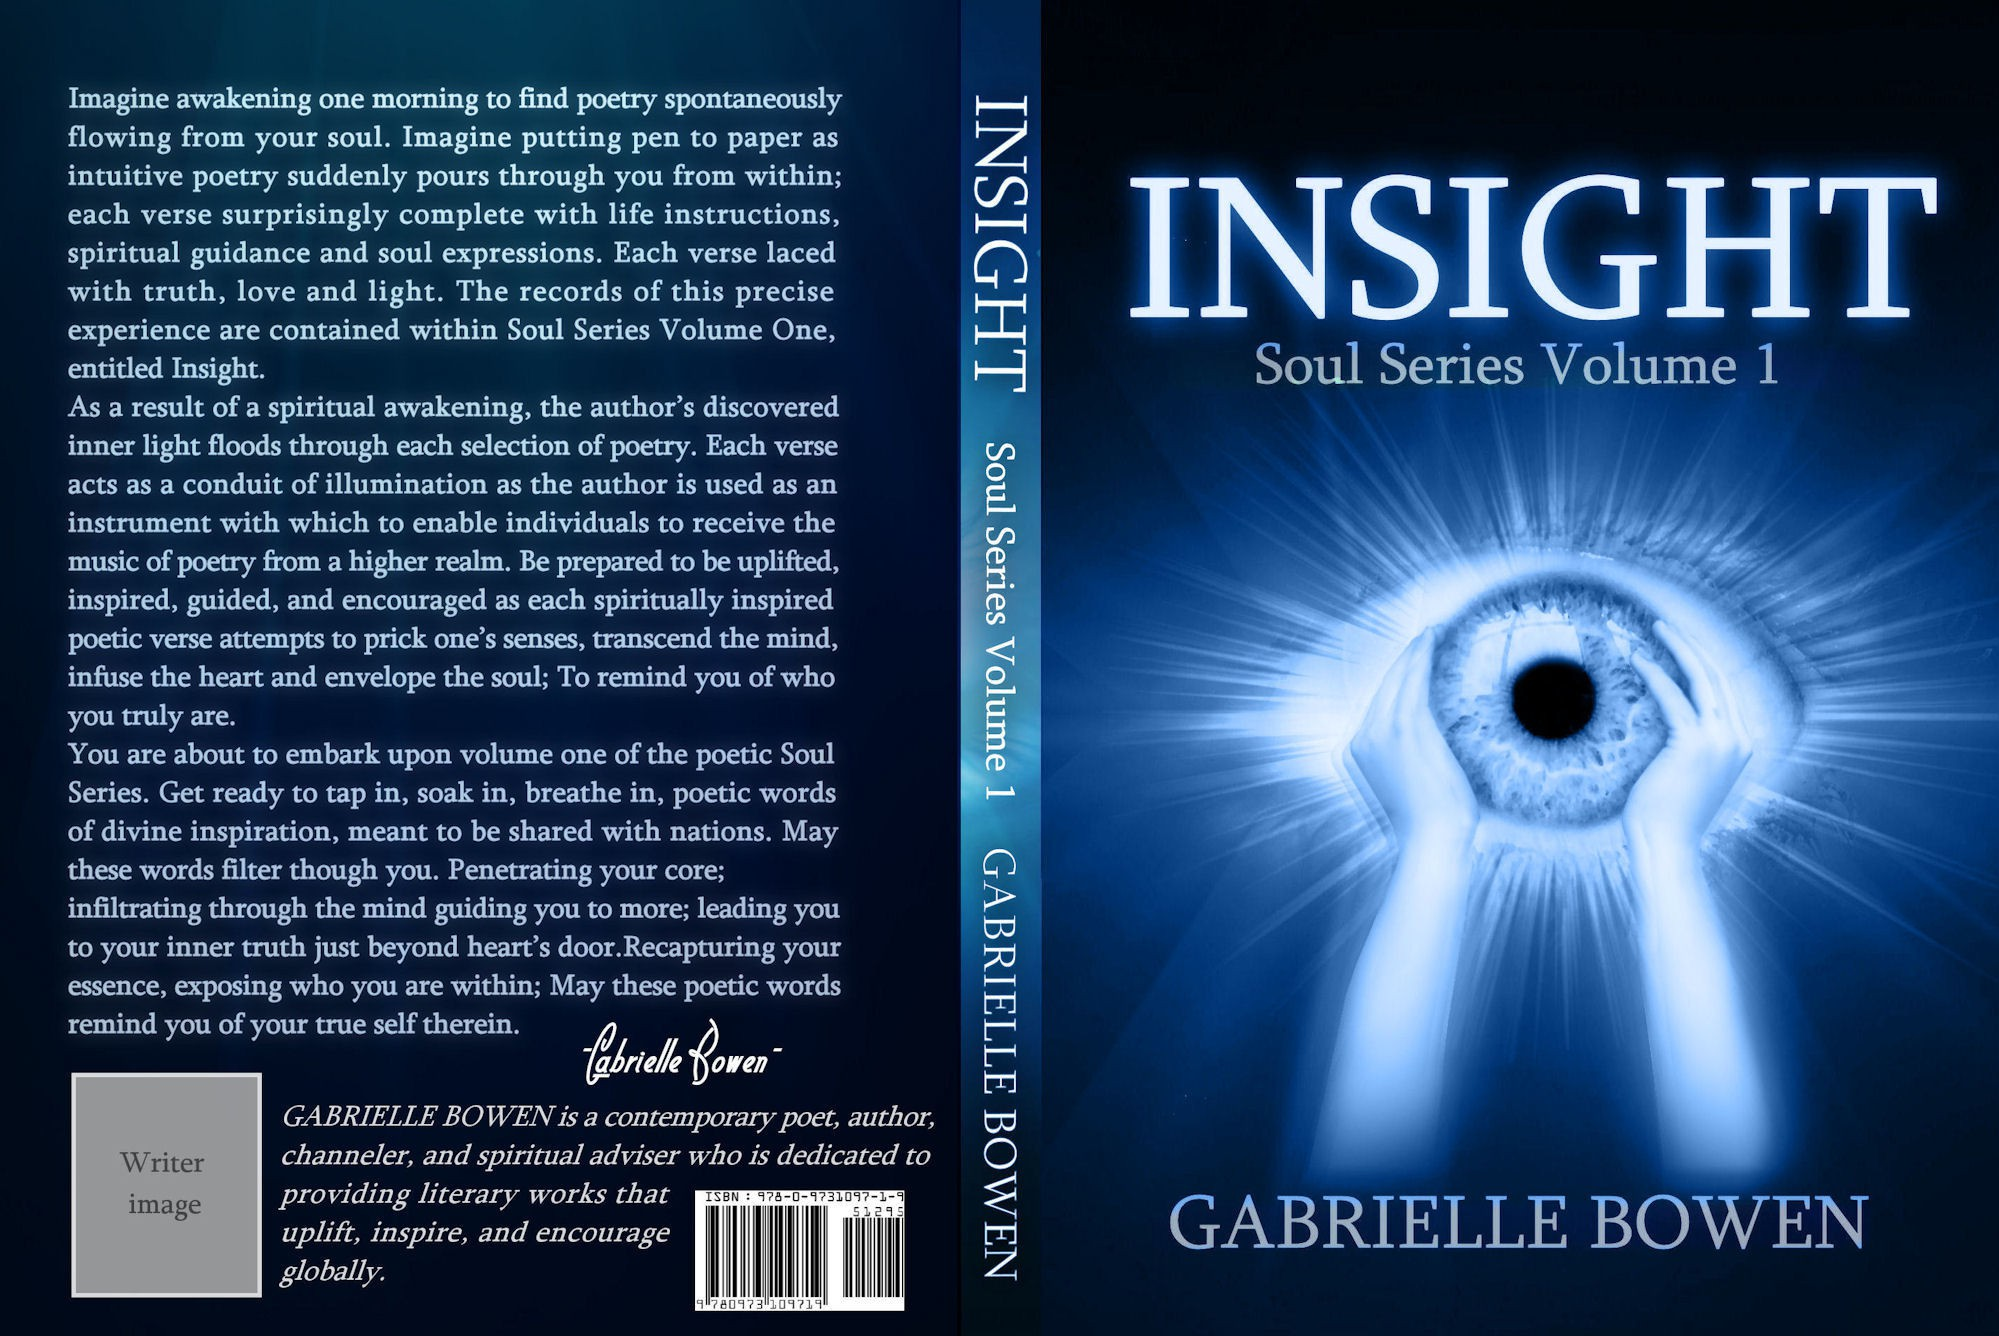 Book Cover Design Needed